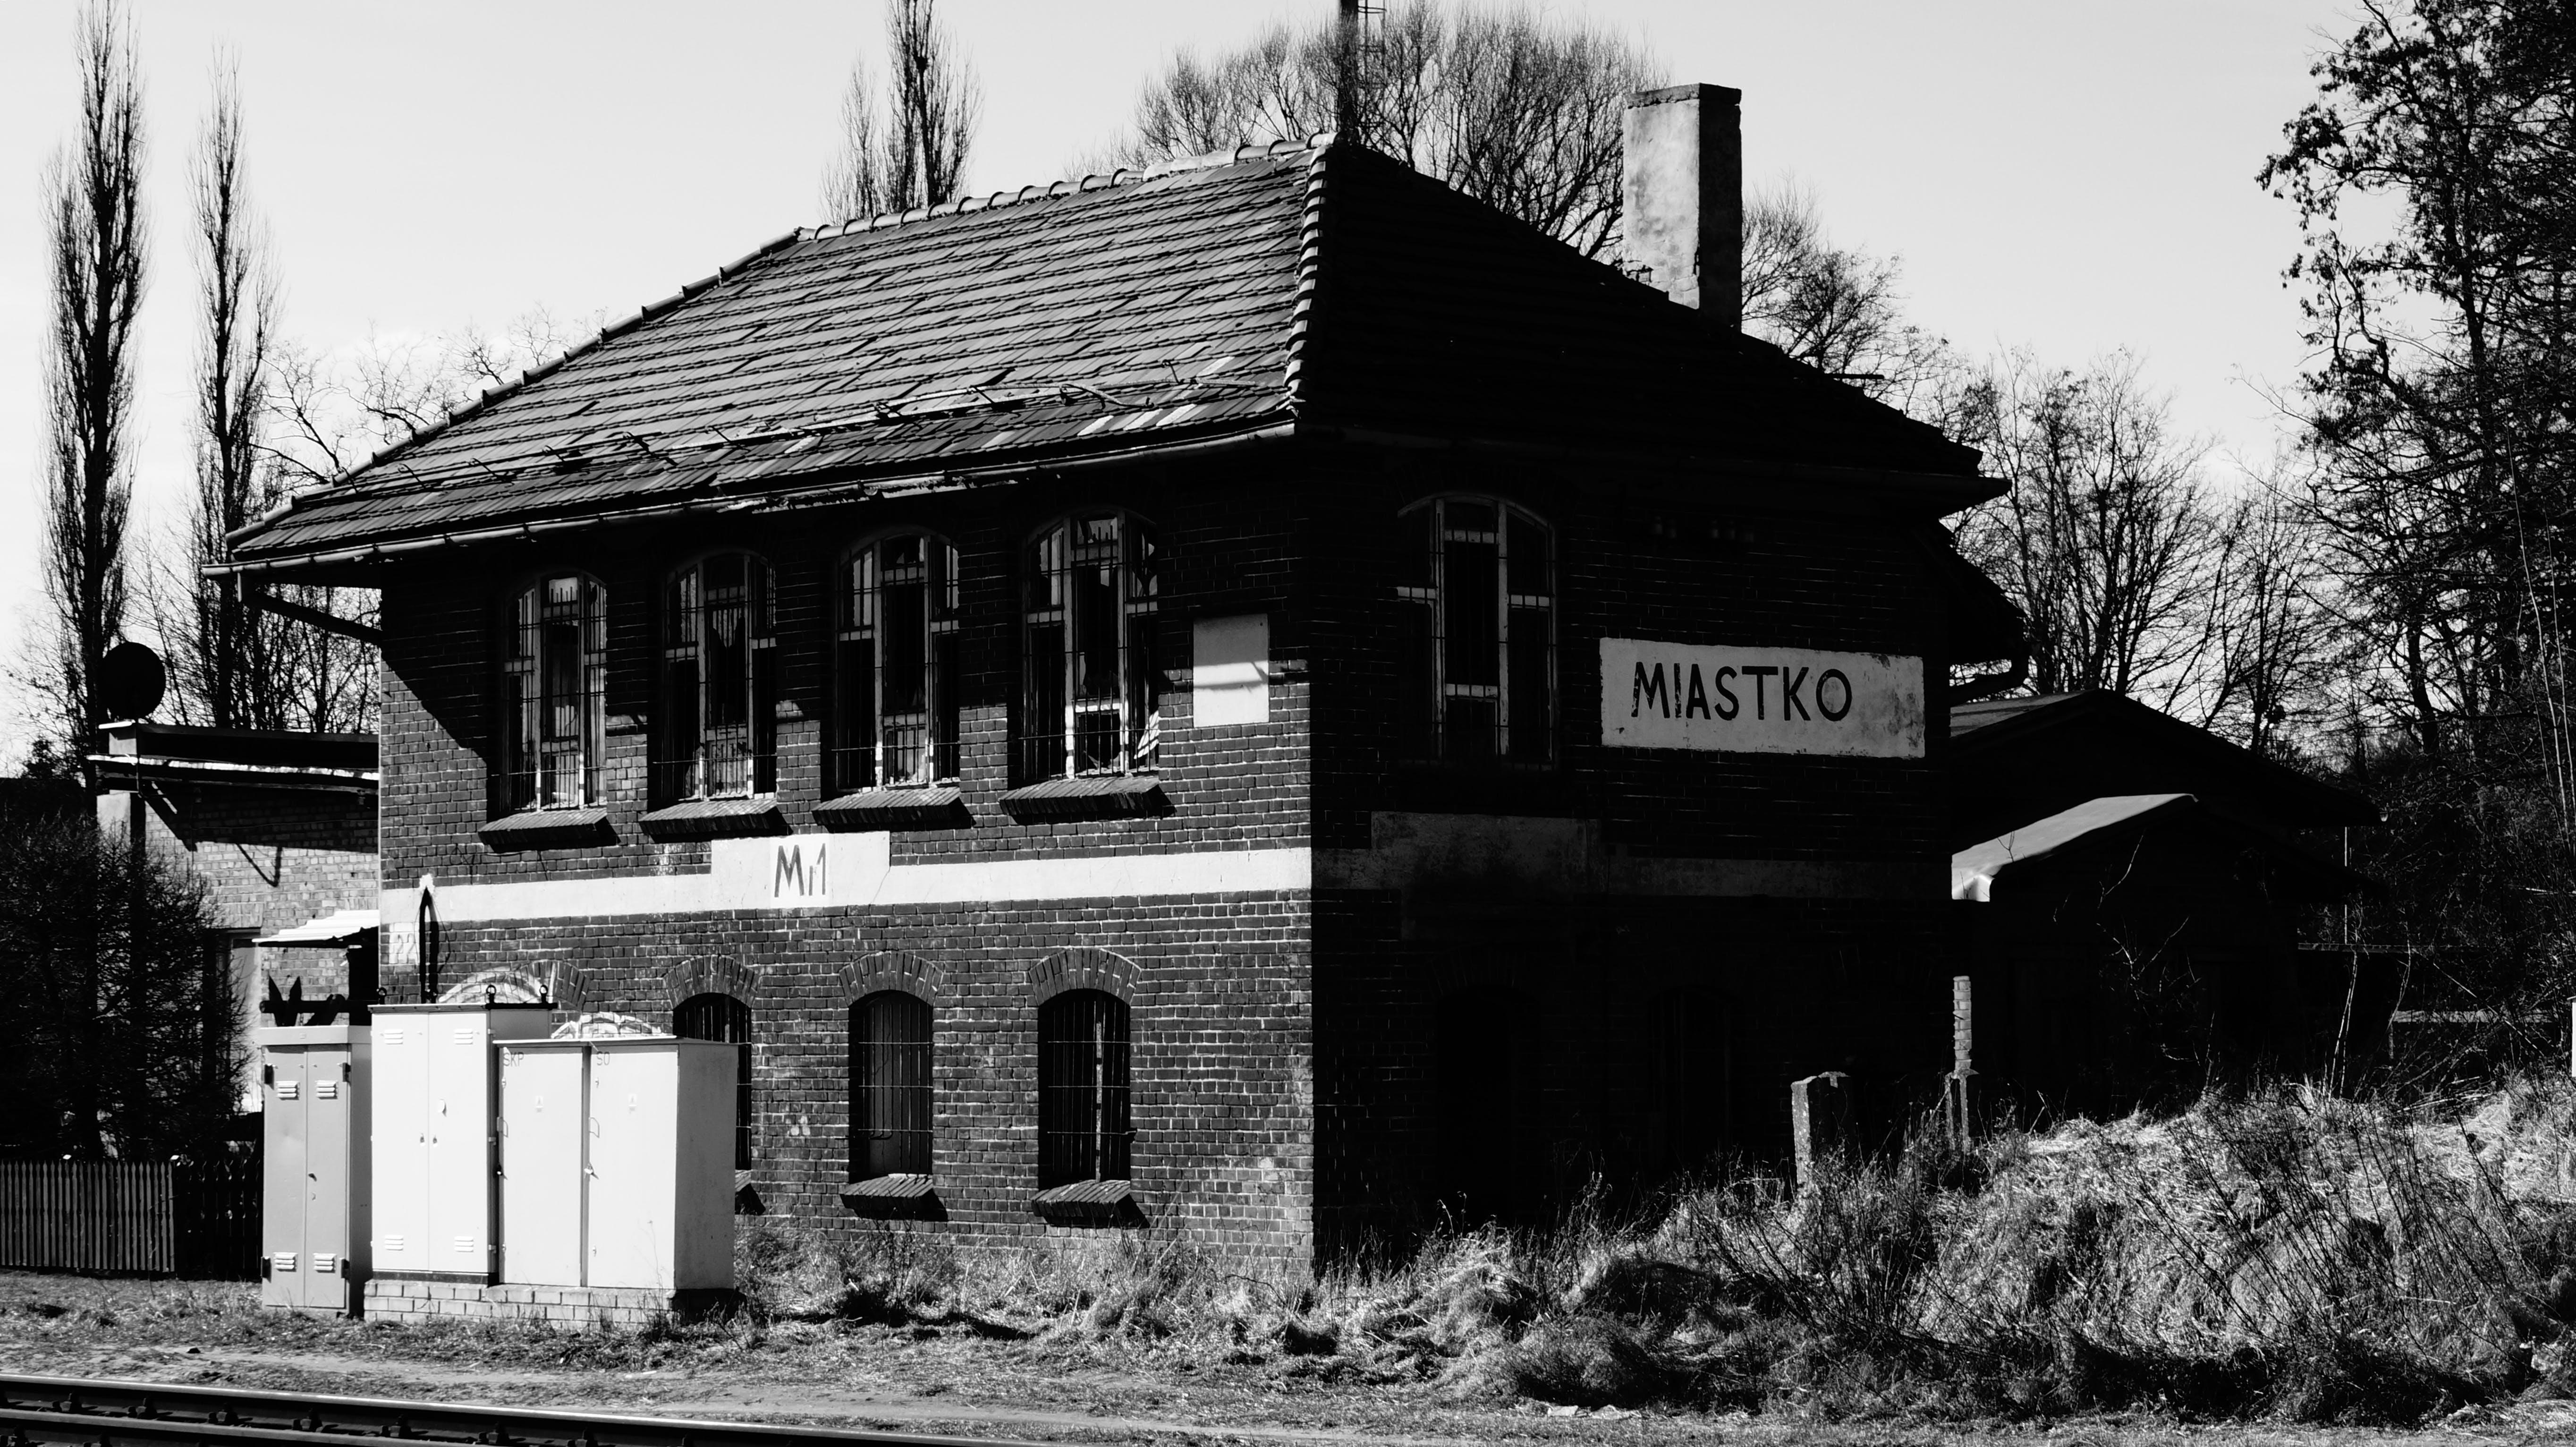 Free stock photo of studjo yavor-miastko